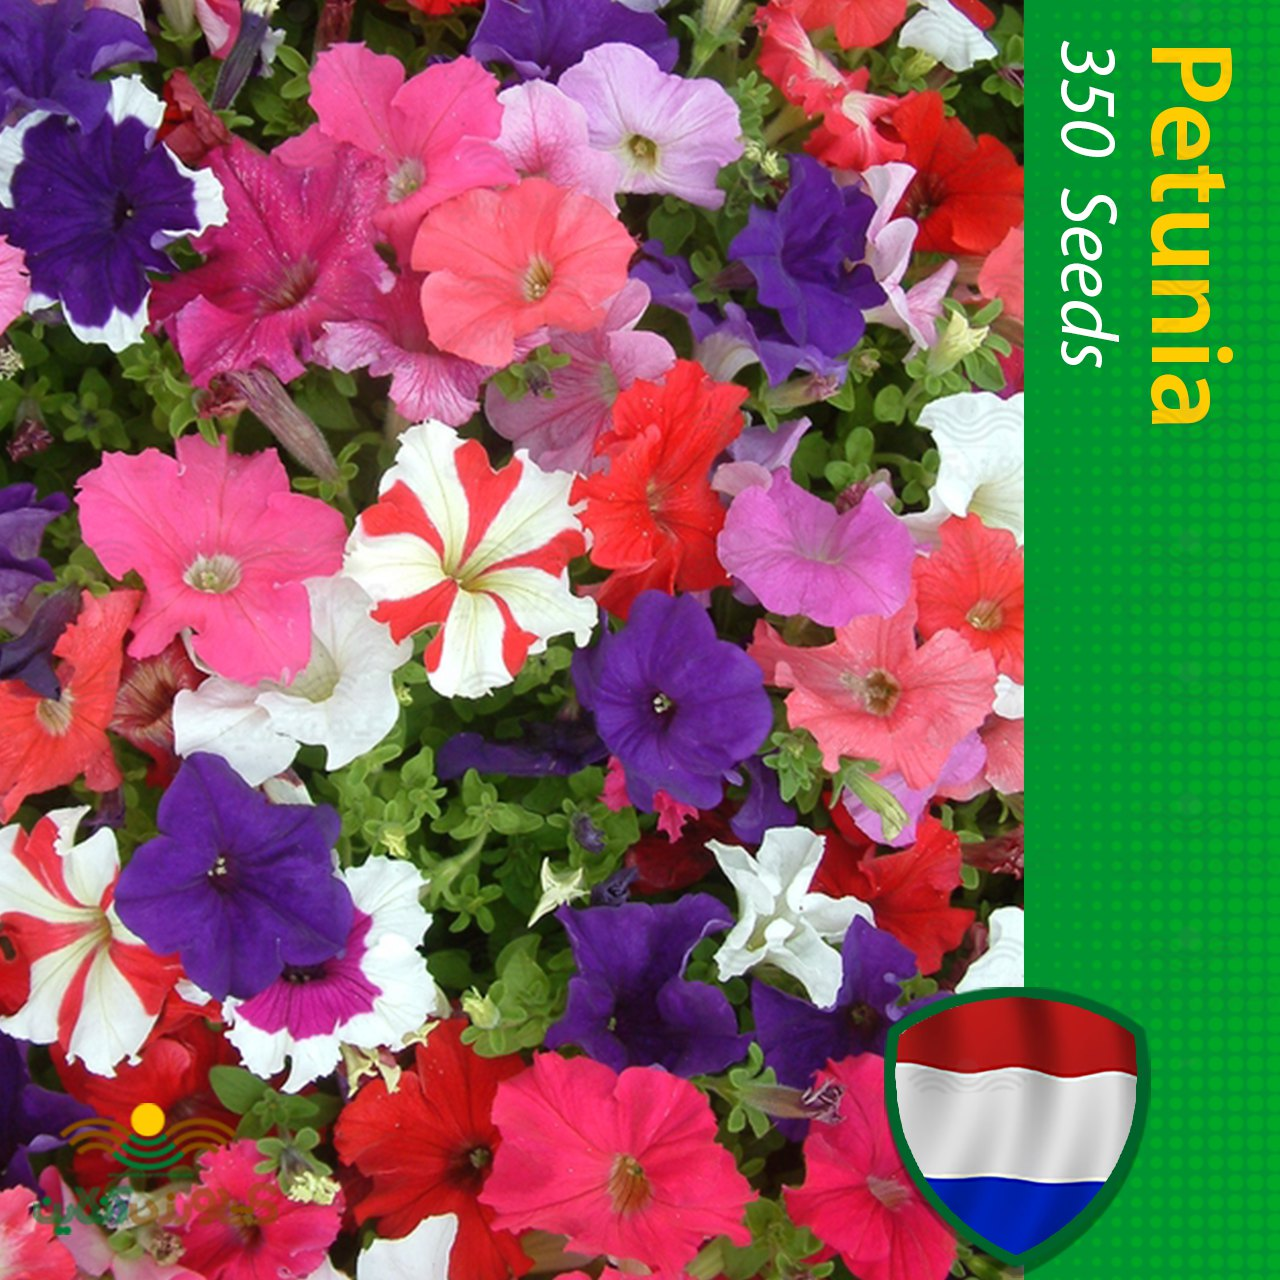 بذر گل اطلسی هلندی الوان